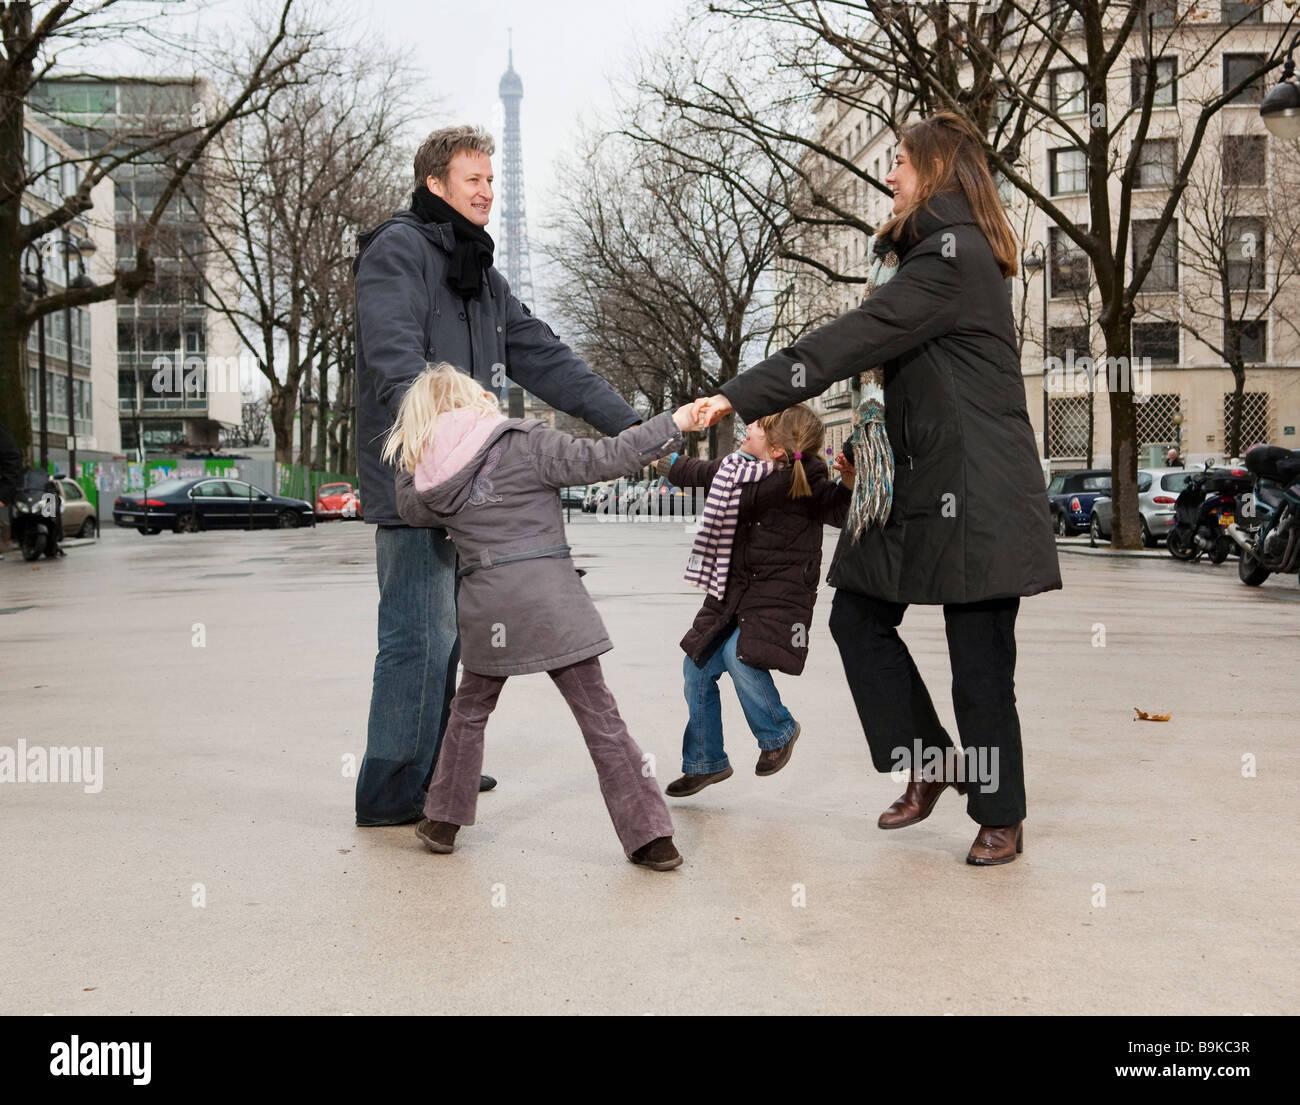 Family dancing near Eiffel Tower - Stock Image